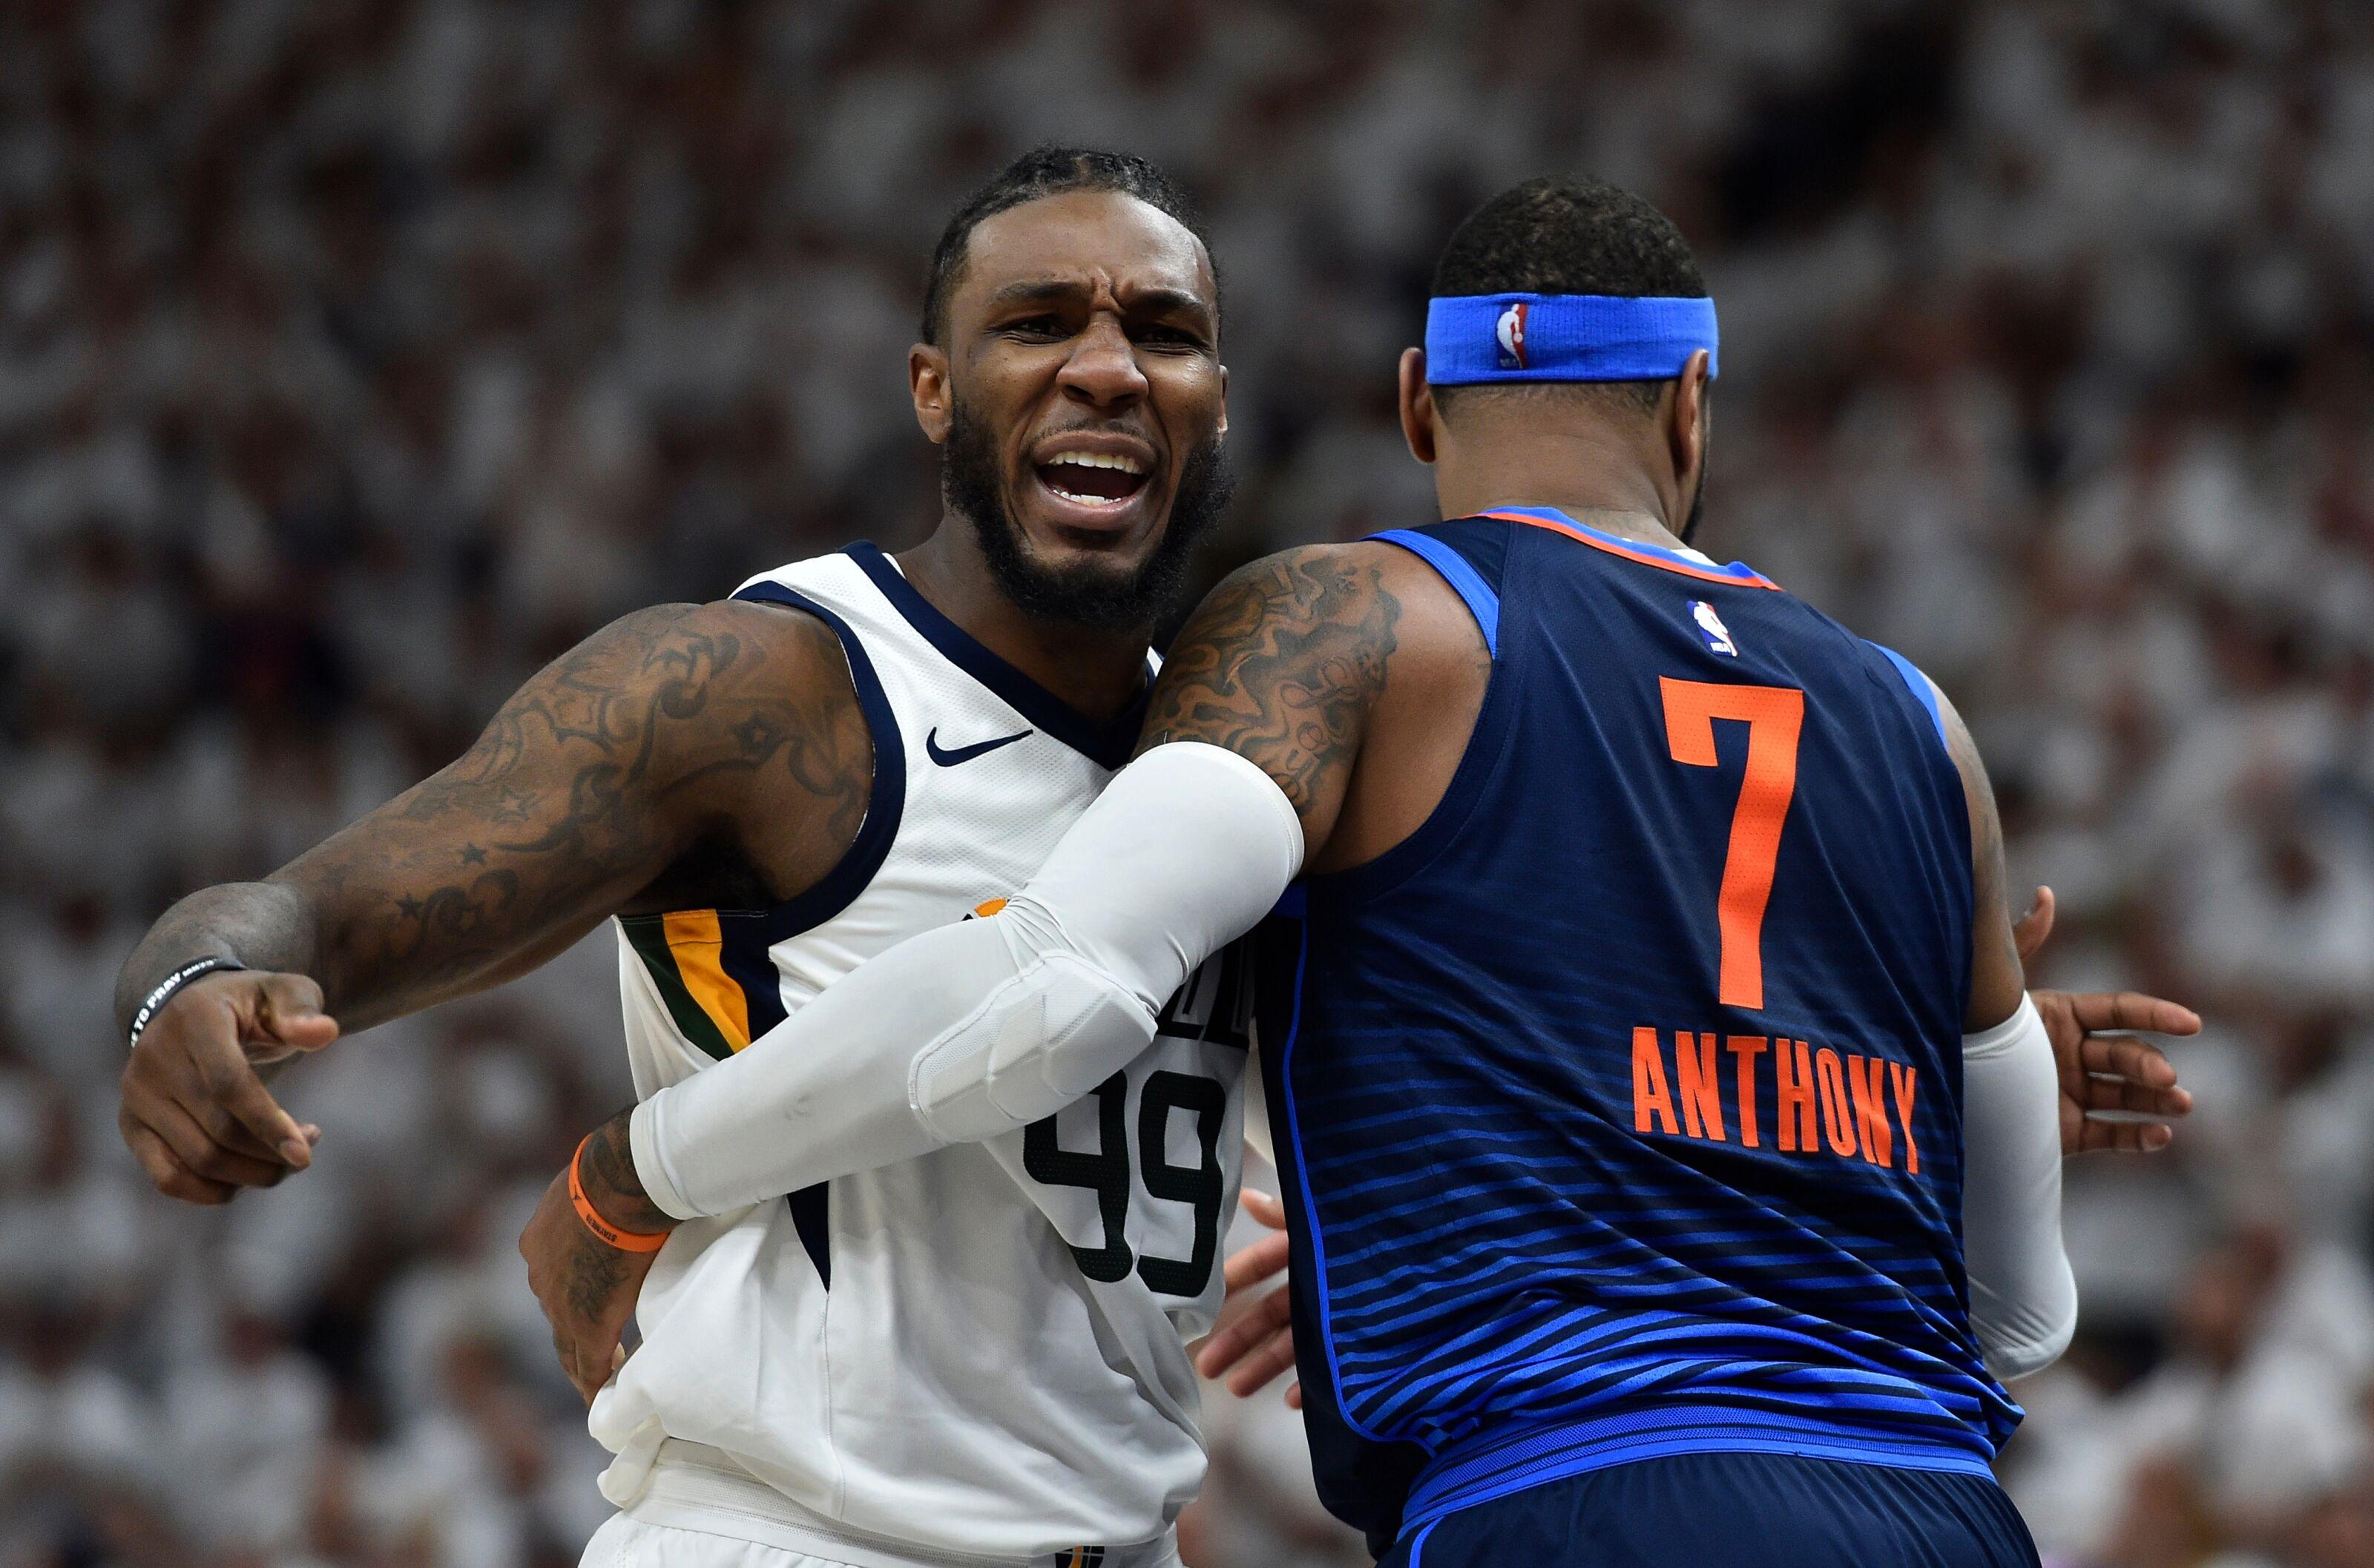 Nba Playoffs 2018 Oklahoma City Thunder Vs Utah Jazz Game 5 Live